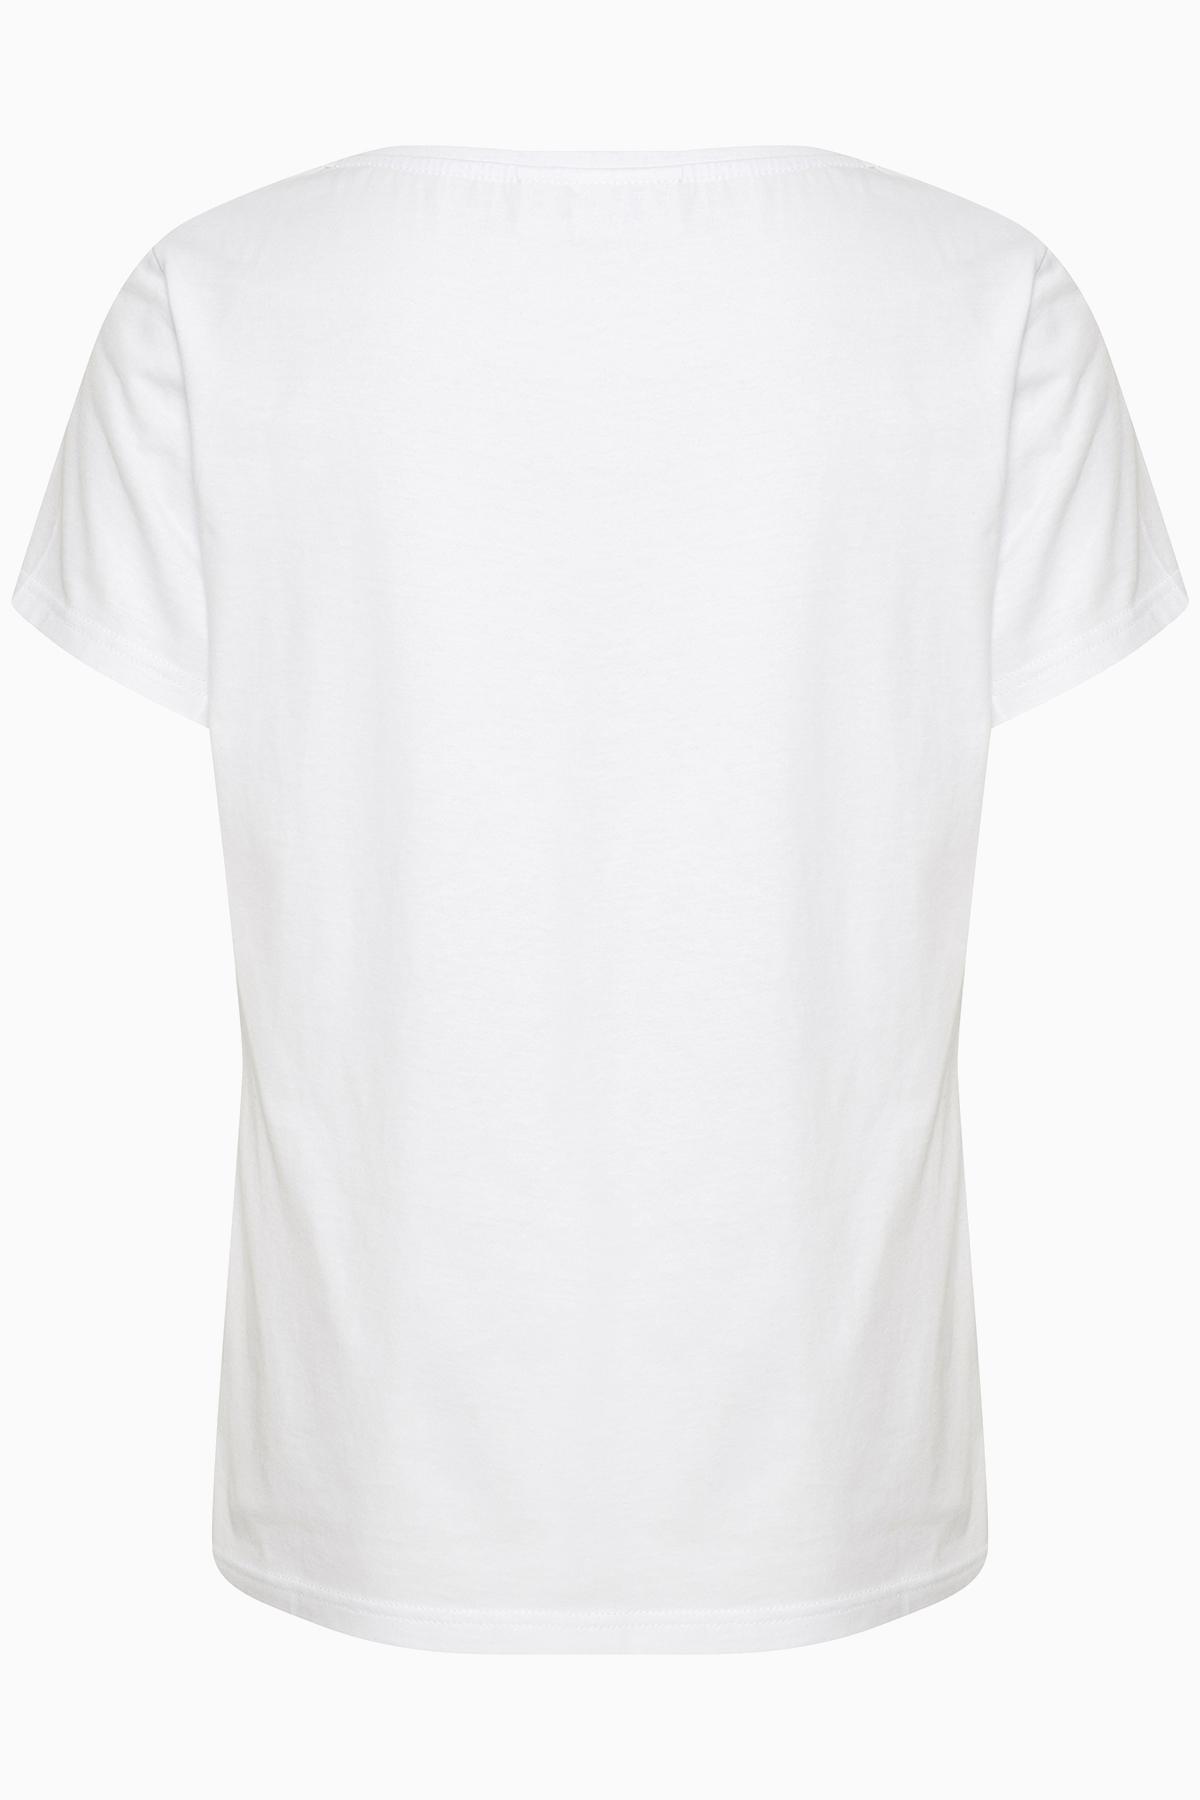 Off-white/groen T-shirt korte mouw van Kaffe – Door Off-white/groen T-shirt korte mouw van maat. XS-XXL hier